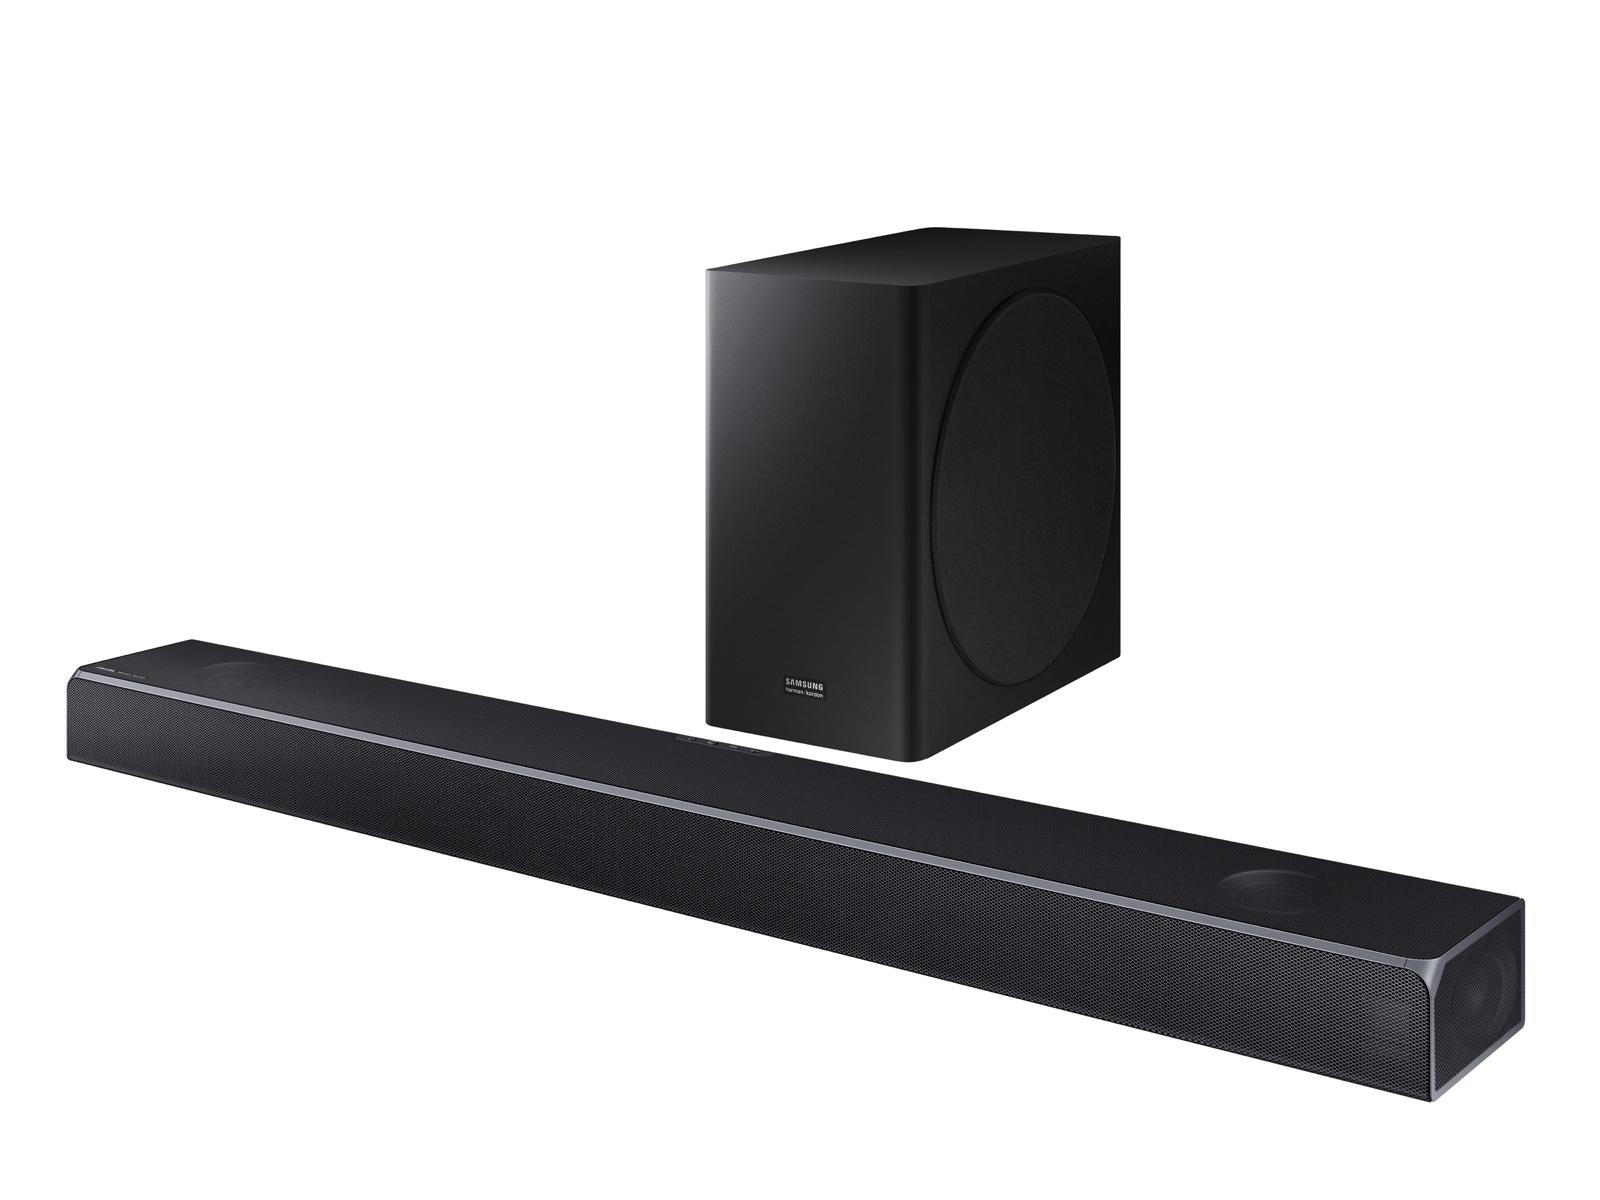 Samsung HW-Q80R 370W Virtual 5.1.2 Ch Soundbar System with Dolby Atmos and Wireless Subwoofer